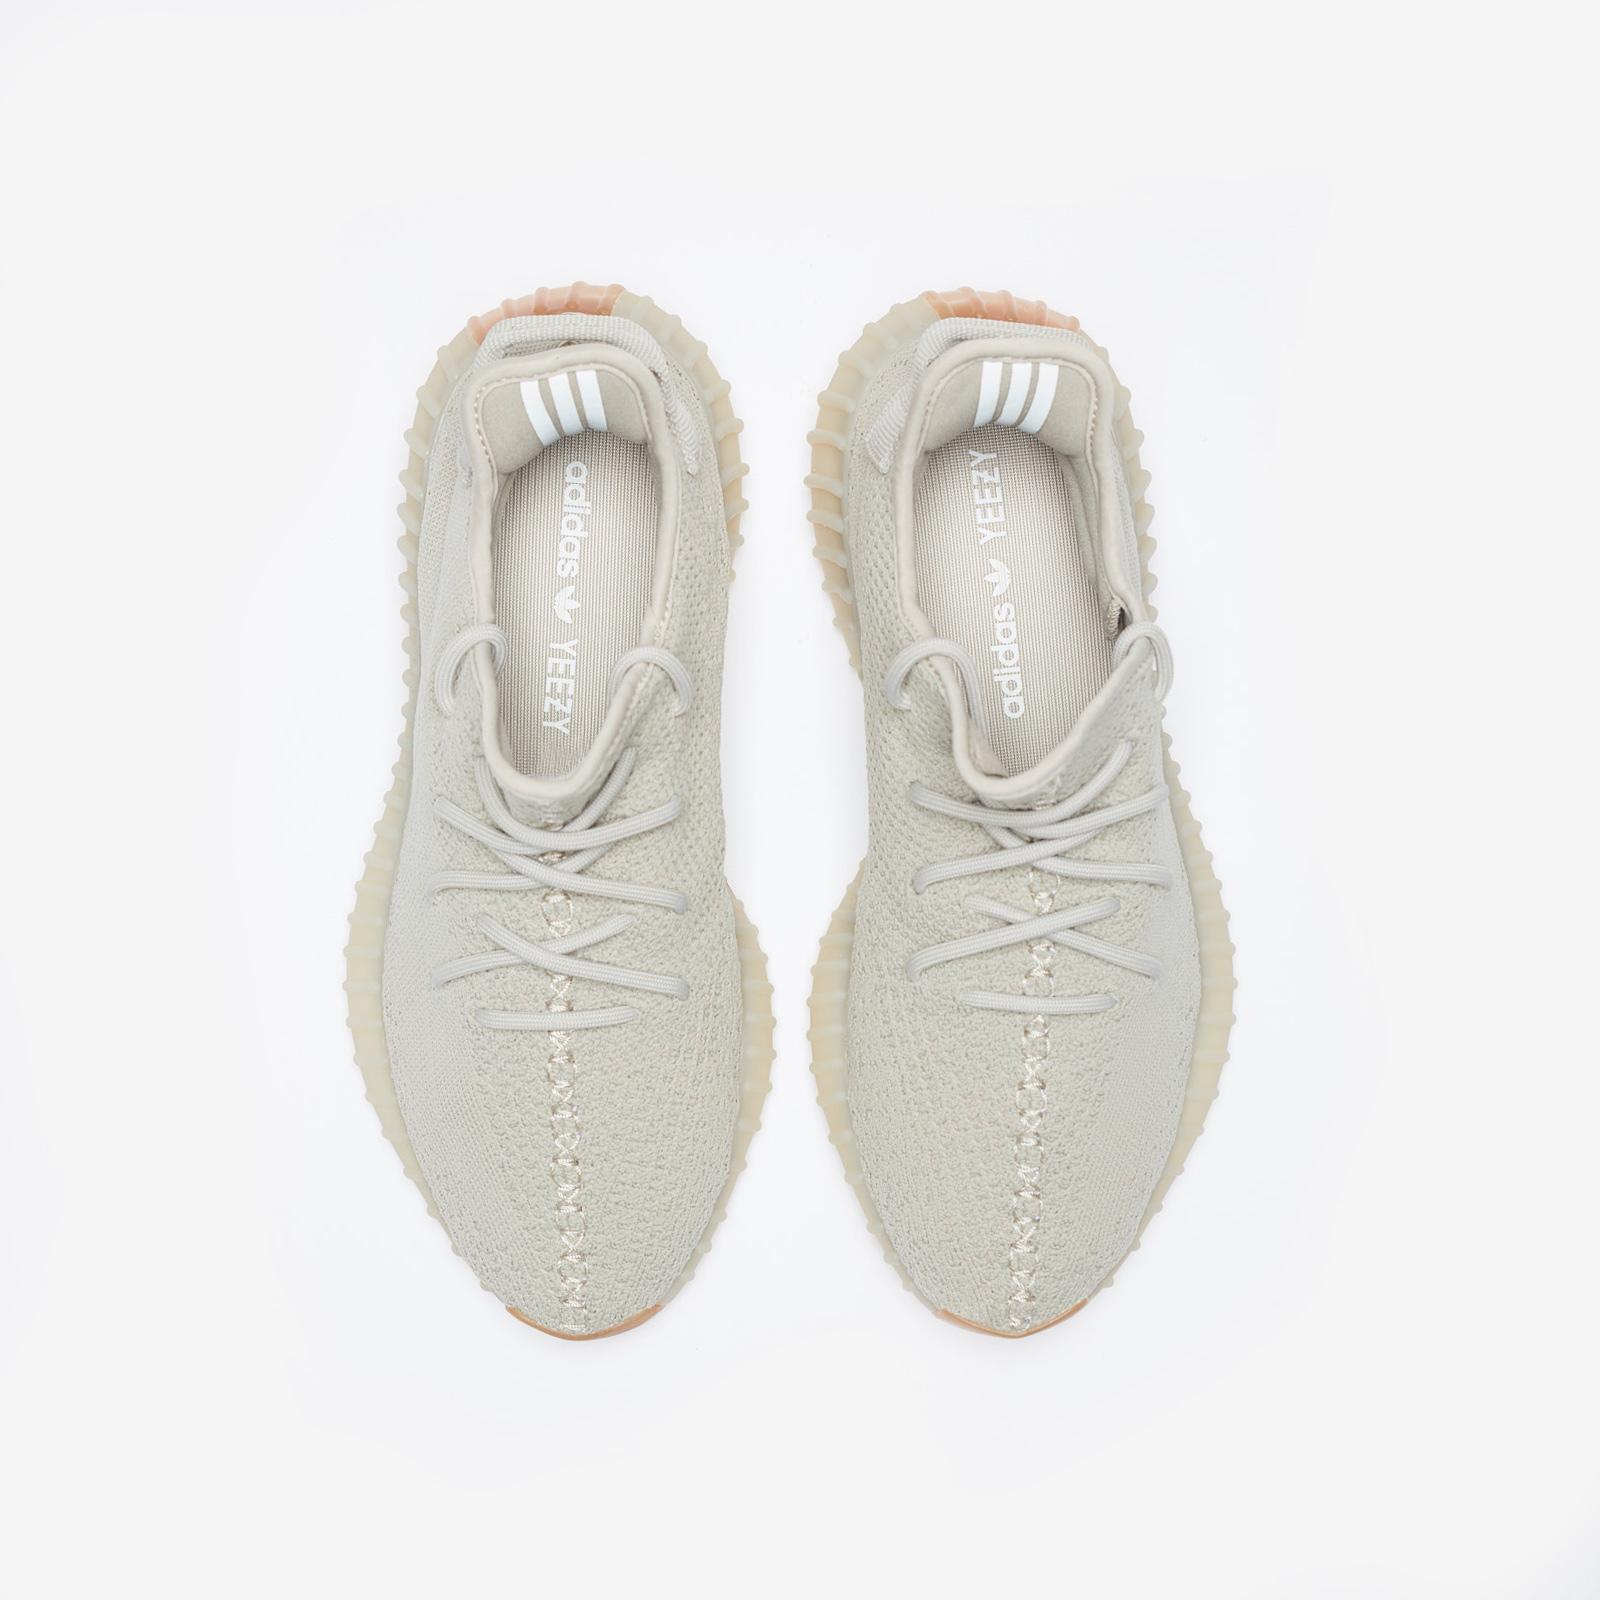 adidas Yeezy Boost 350 V2 F99710 Sneakersnstuff